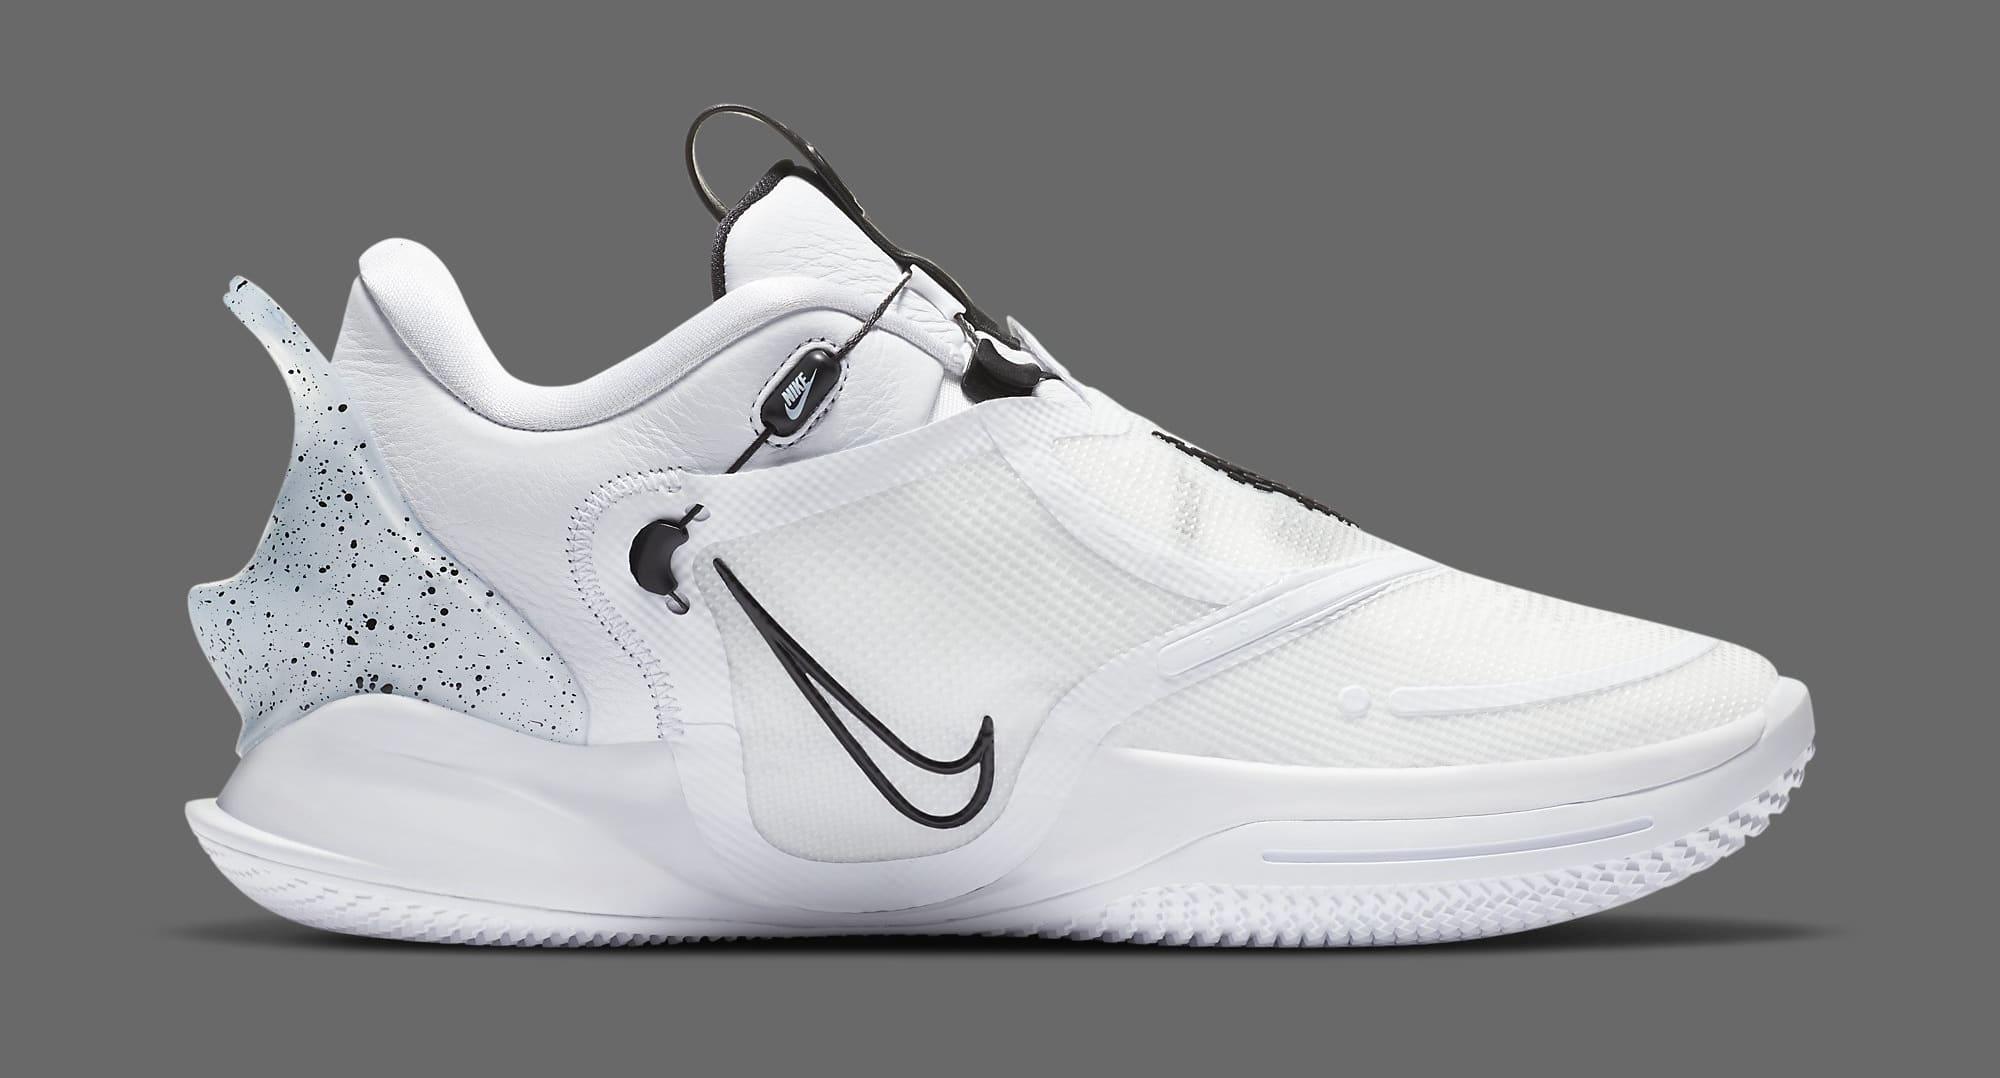 Nike Adapt BB 2.0 'Oreo' BQ5397-101 Medial